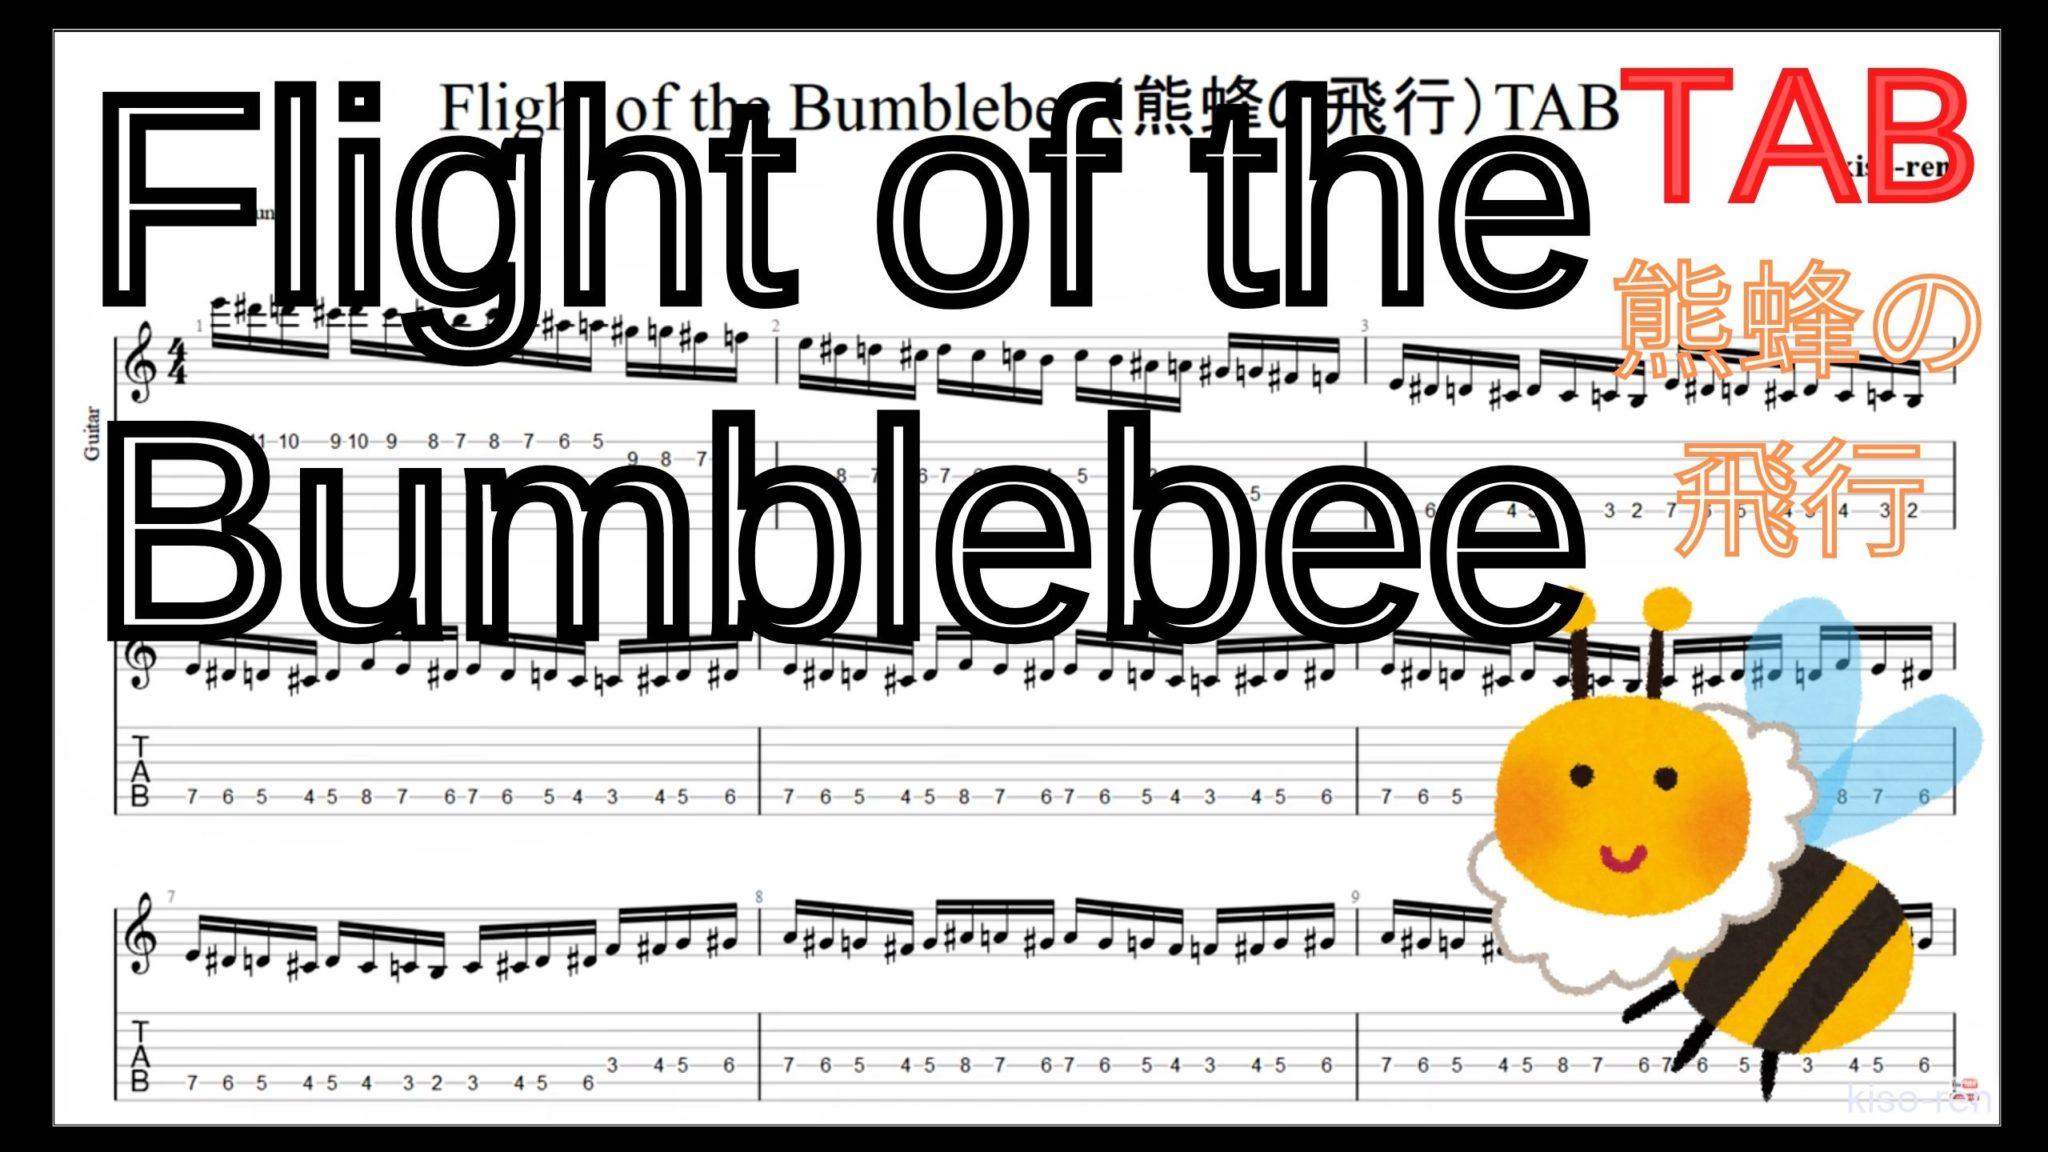 【TAB】Flight of the Bumblebee Guitar TAB / 熊蜂の飛行 ギター TAB 楽譜【TAB ギターソロ速弾き】